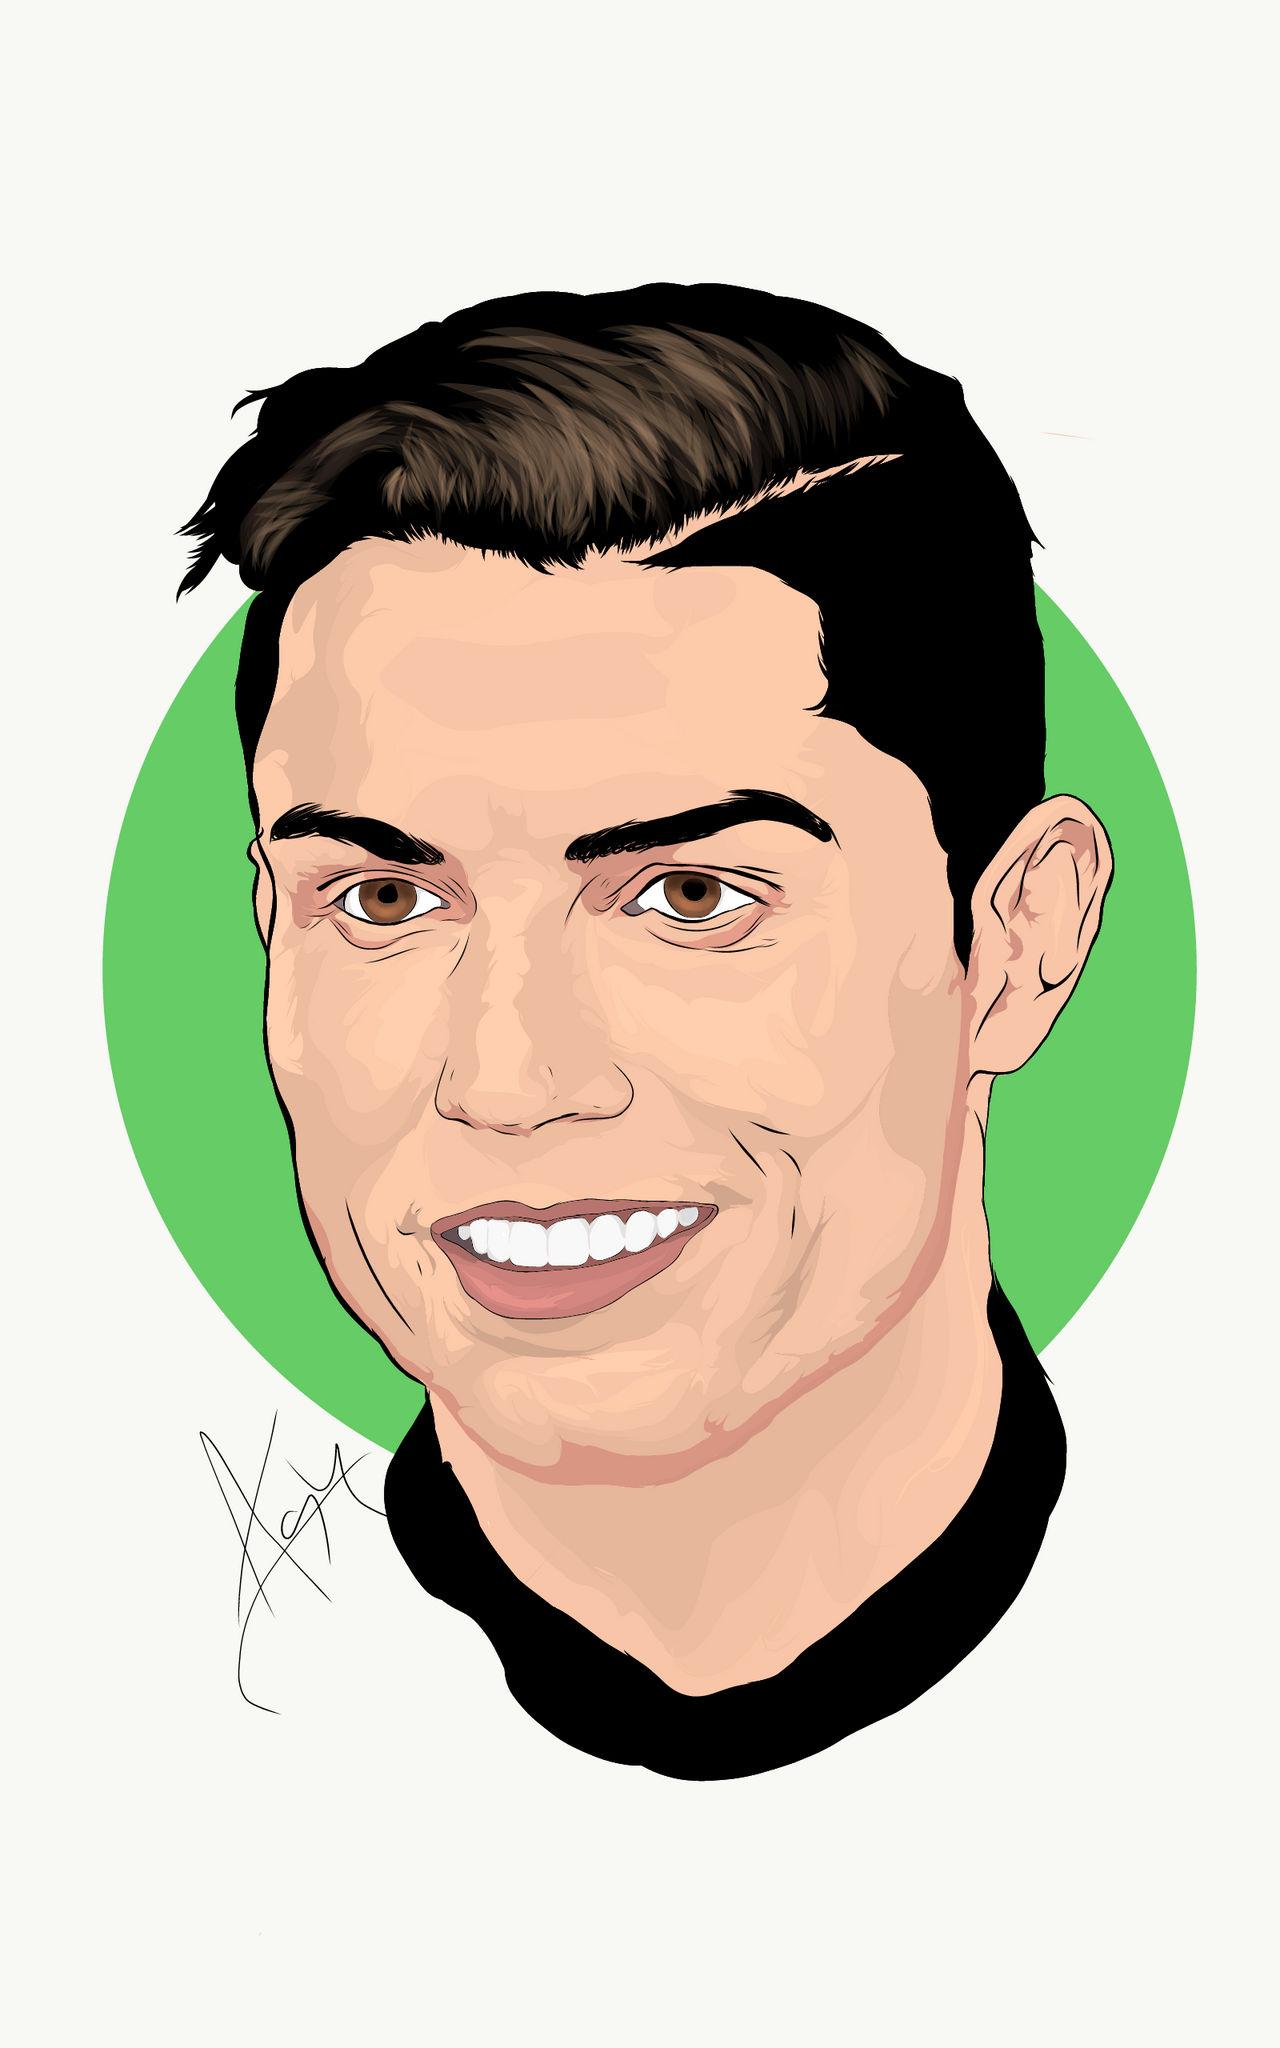 Cristiano Ronaldo Illustration By Ashrafulrayan On Deviantart